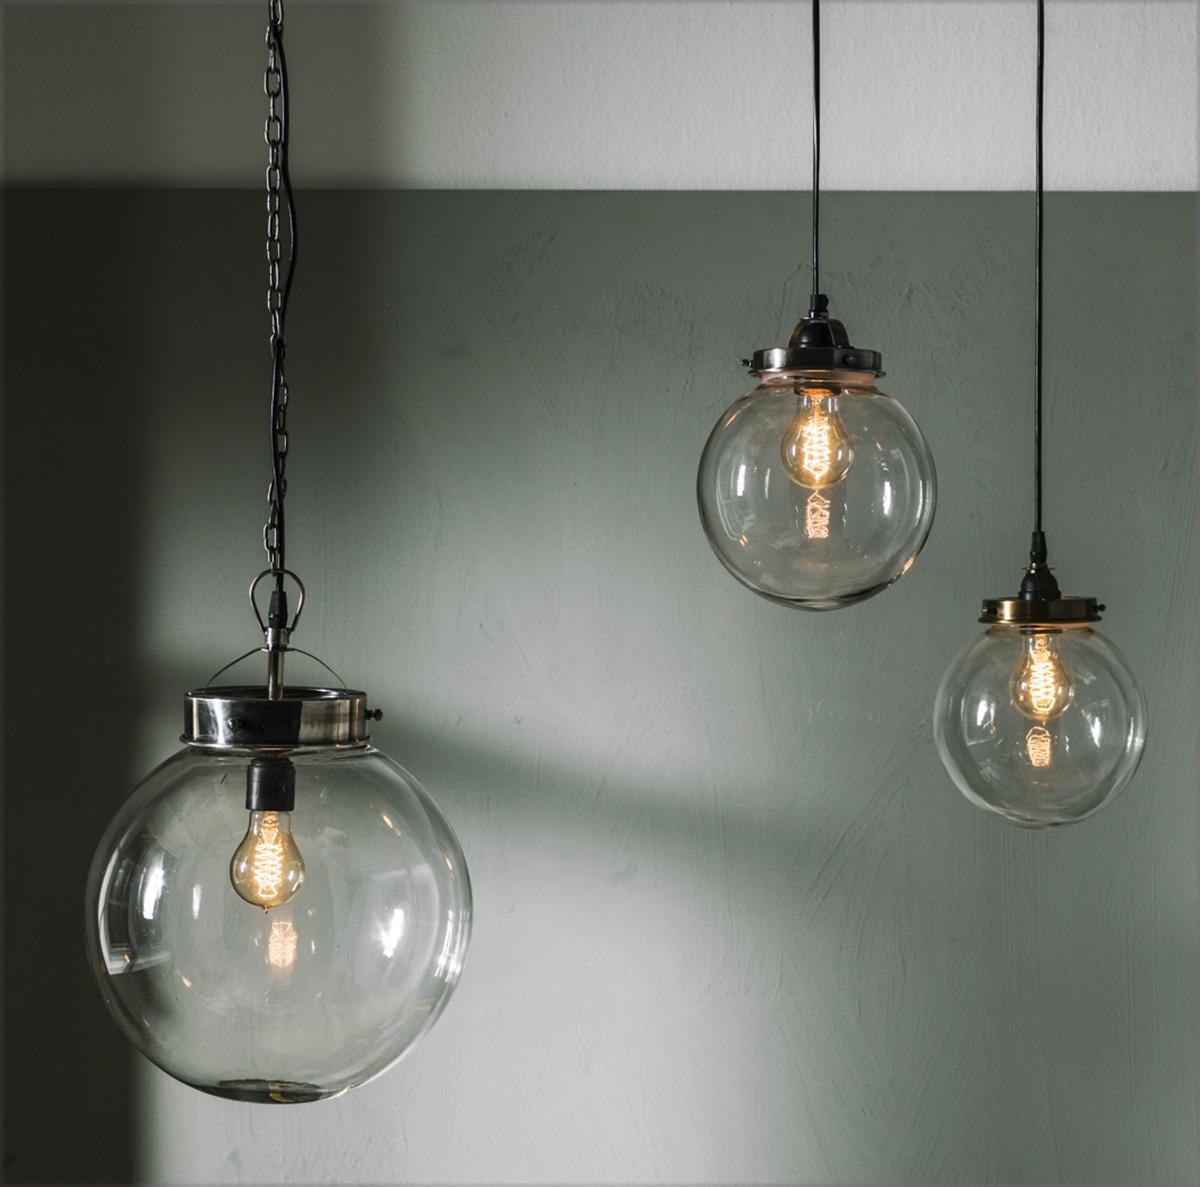 dusch skjutdrrar glas excellent goodwill album with dusch skjutdrrar glas great svedbergs. Black Bedroom Furniture Sets. Home Design Ideas